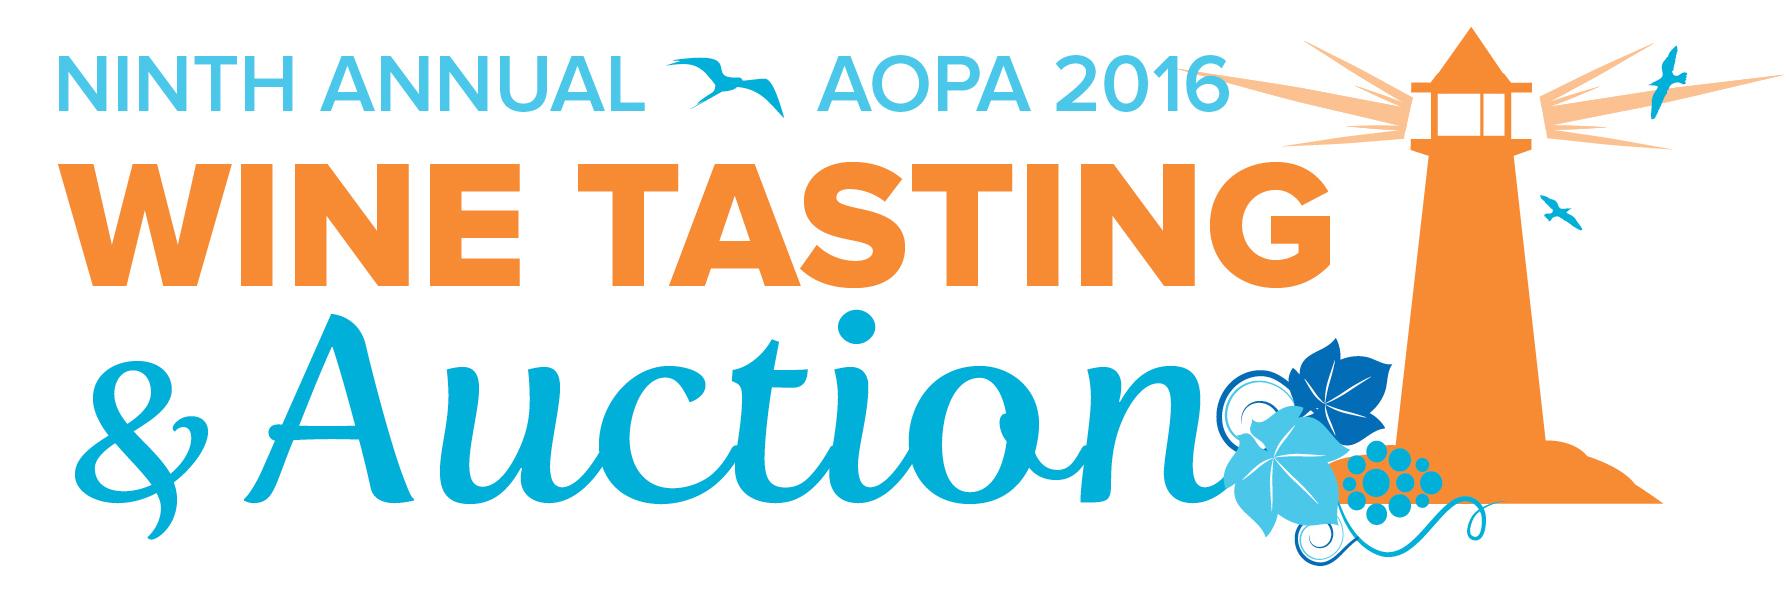 Wine Auction logo-2016